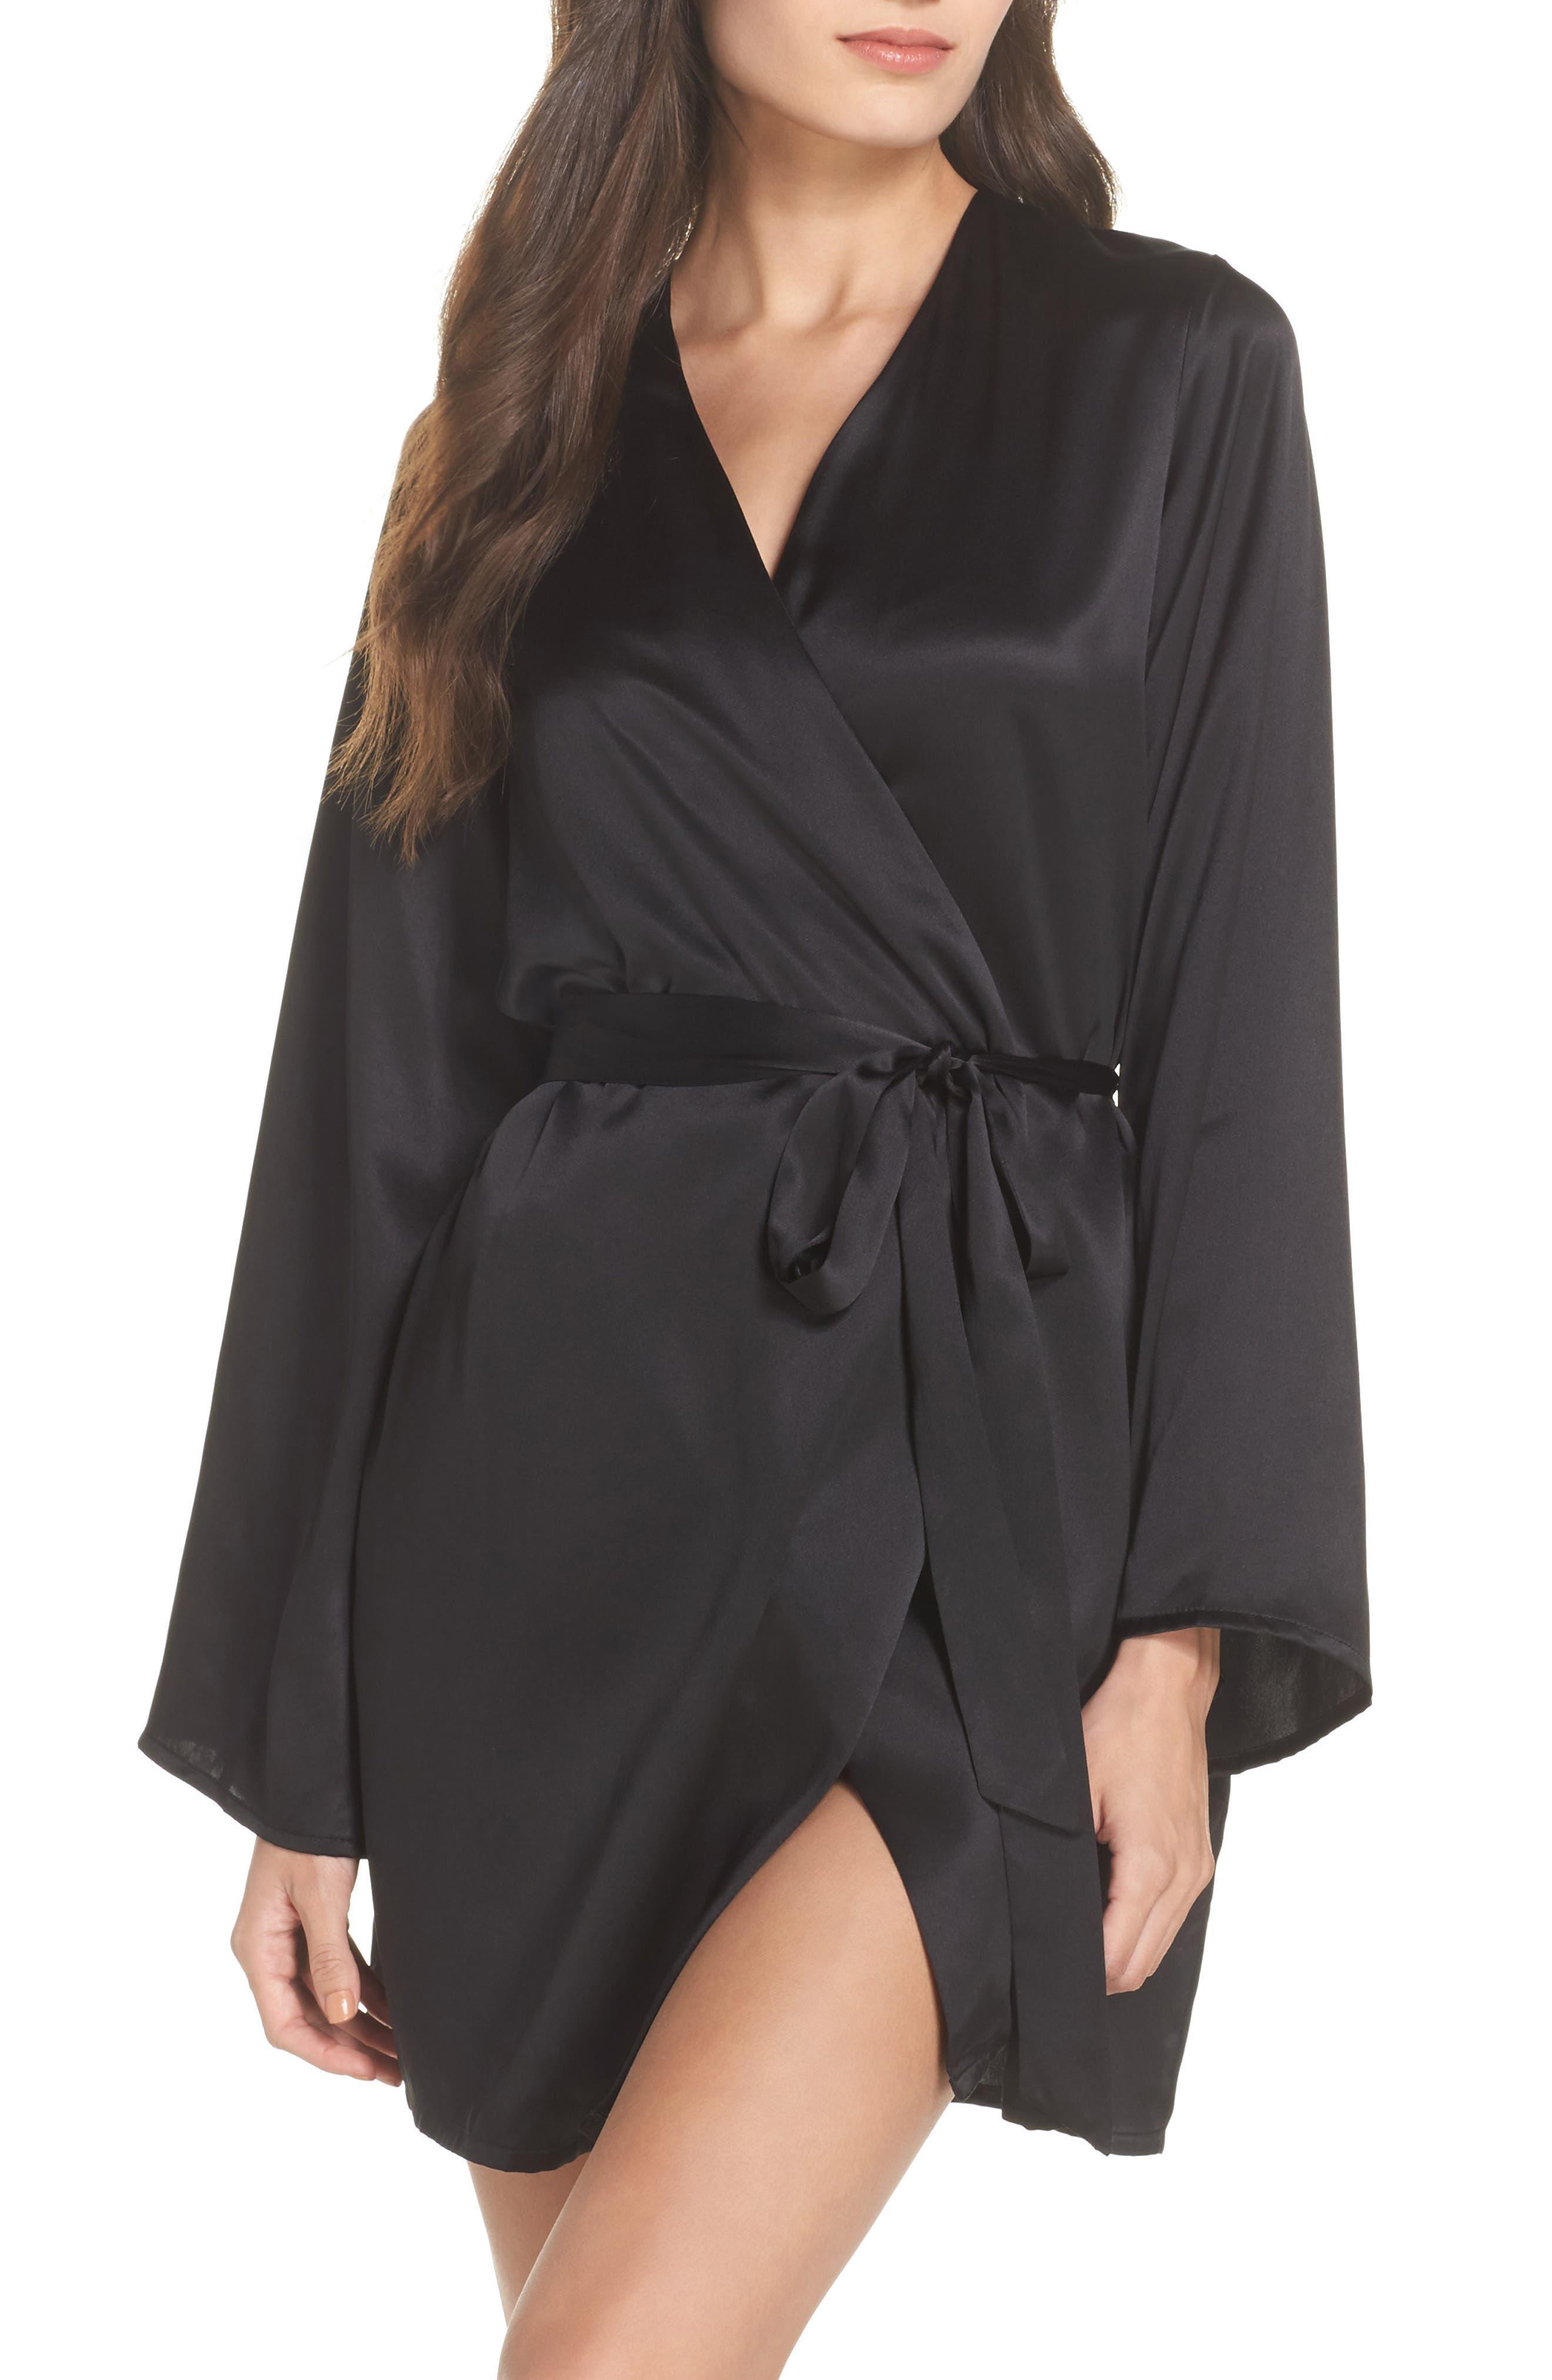 Langley Silk Charmeuse Short Robe,                             Main thumbnail 1, color,                             Noir